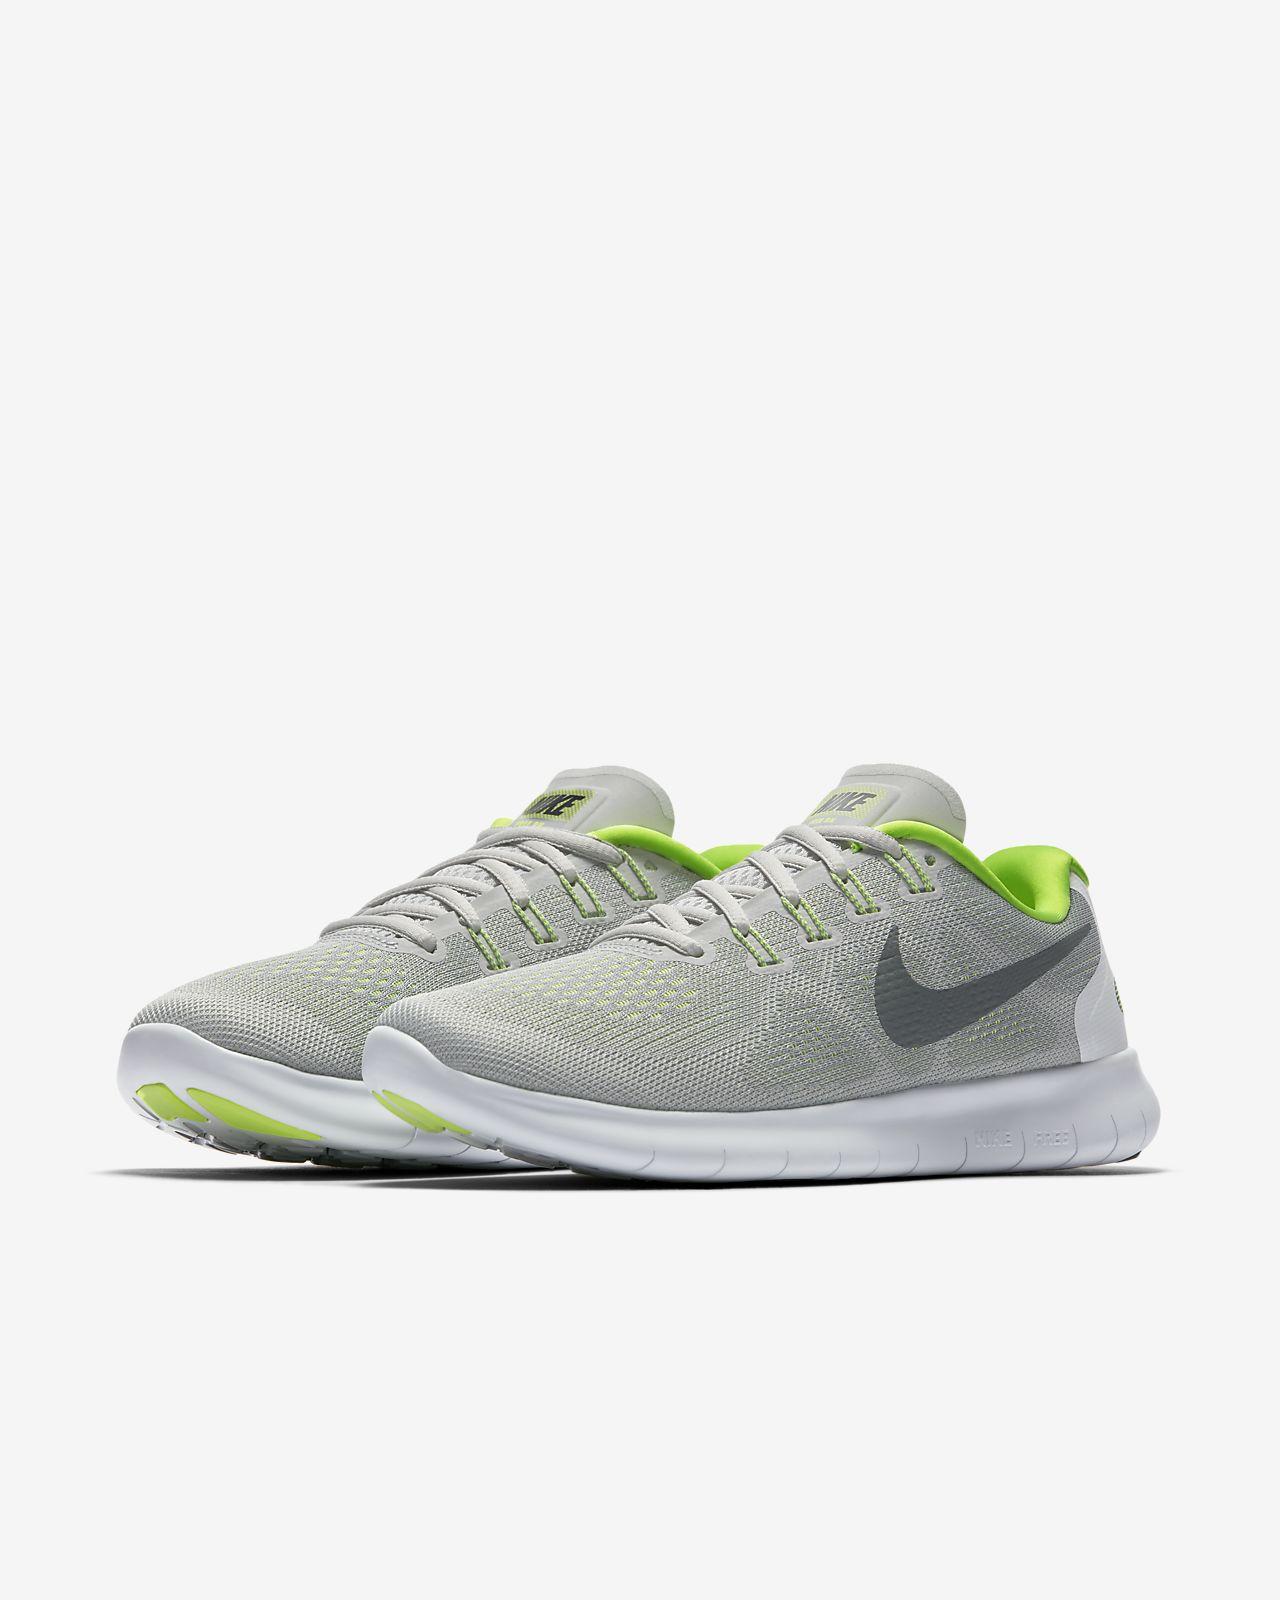 Nike Free Run 2017, Chaussures de Running Femme, Blanc (White/Black-Pure Gris Platinum), 38.5 EU